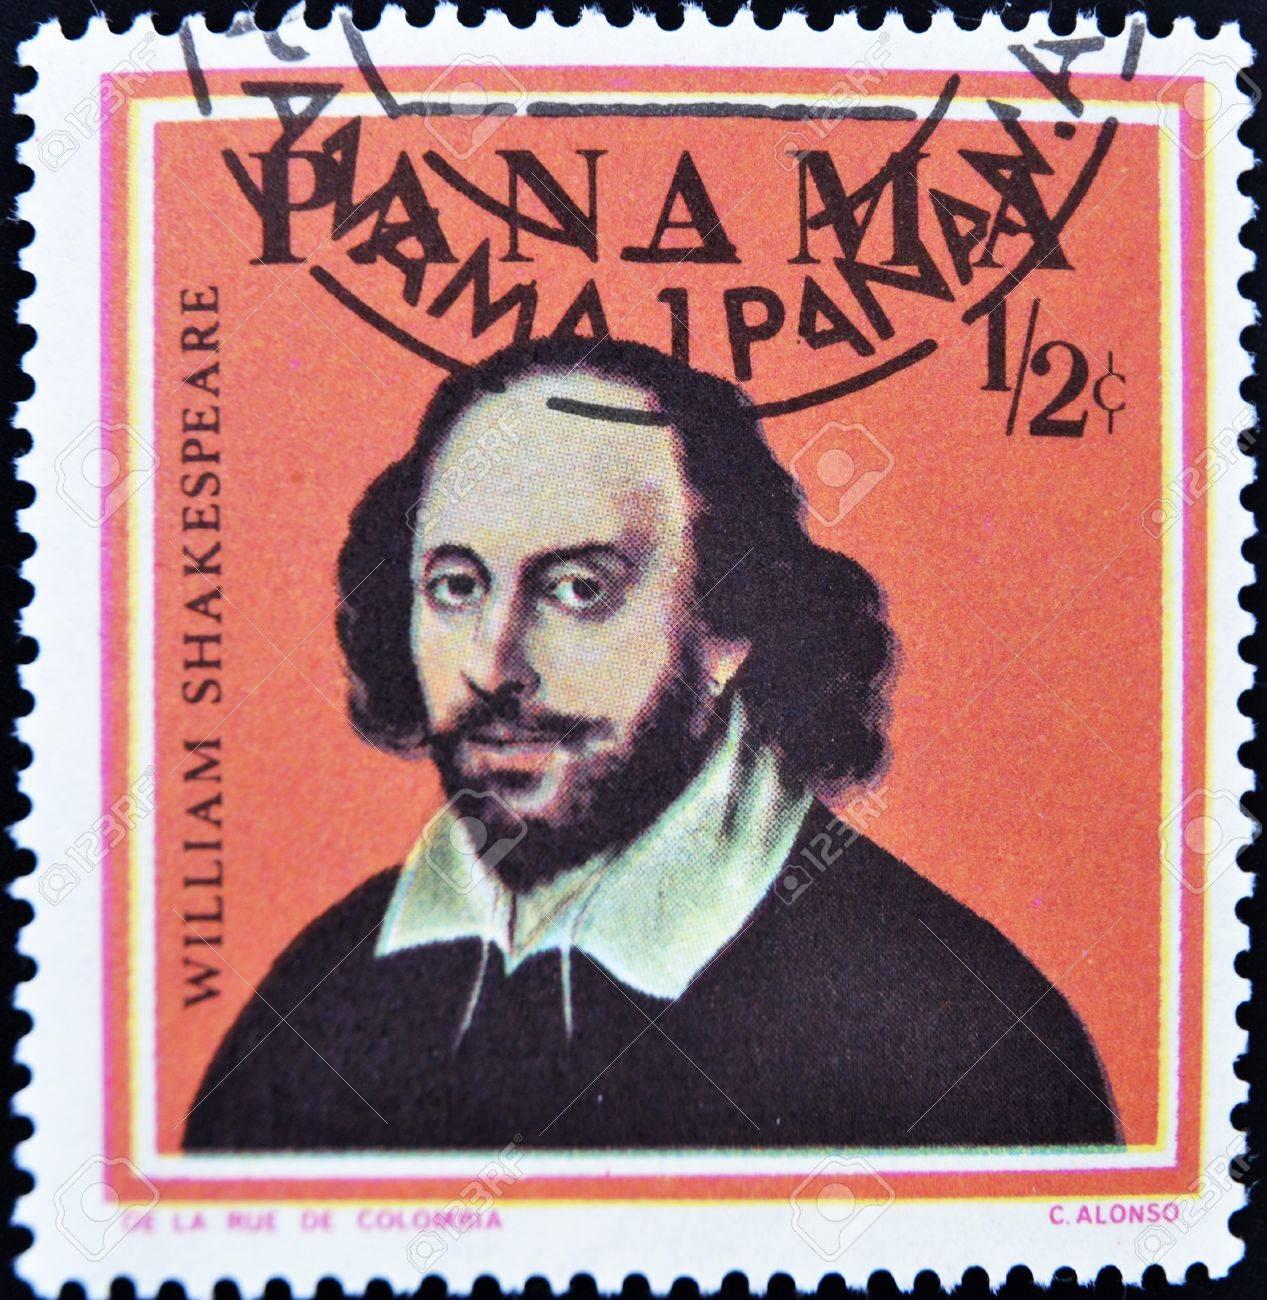 PANAMA - CIRCA 1967: A stamp printed in Panama shows William Shakespeare, circa 1967 Stock Photo - 11099040